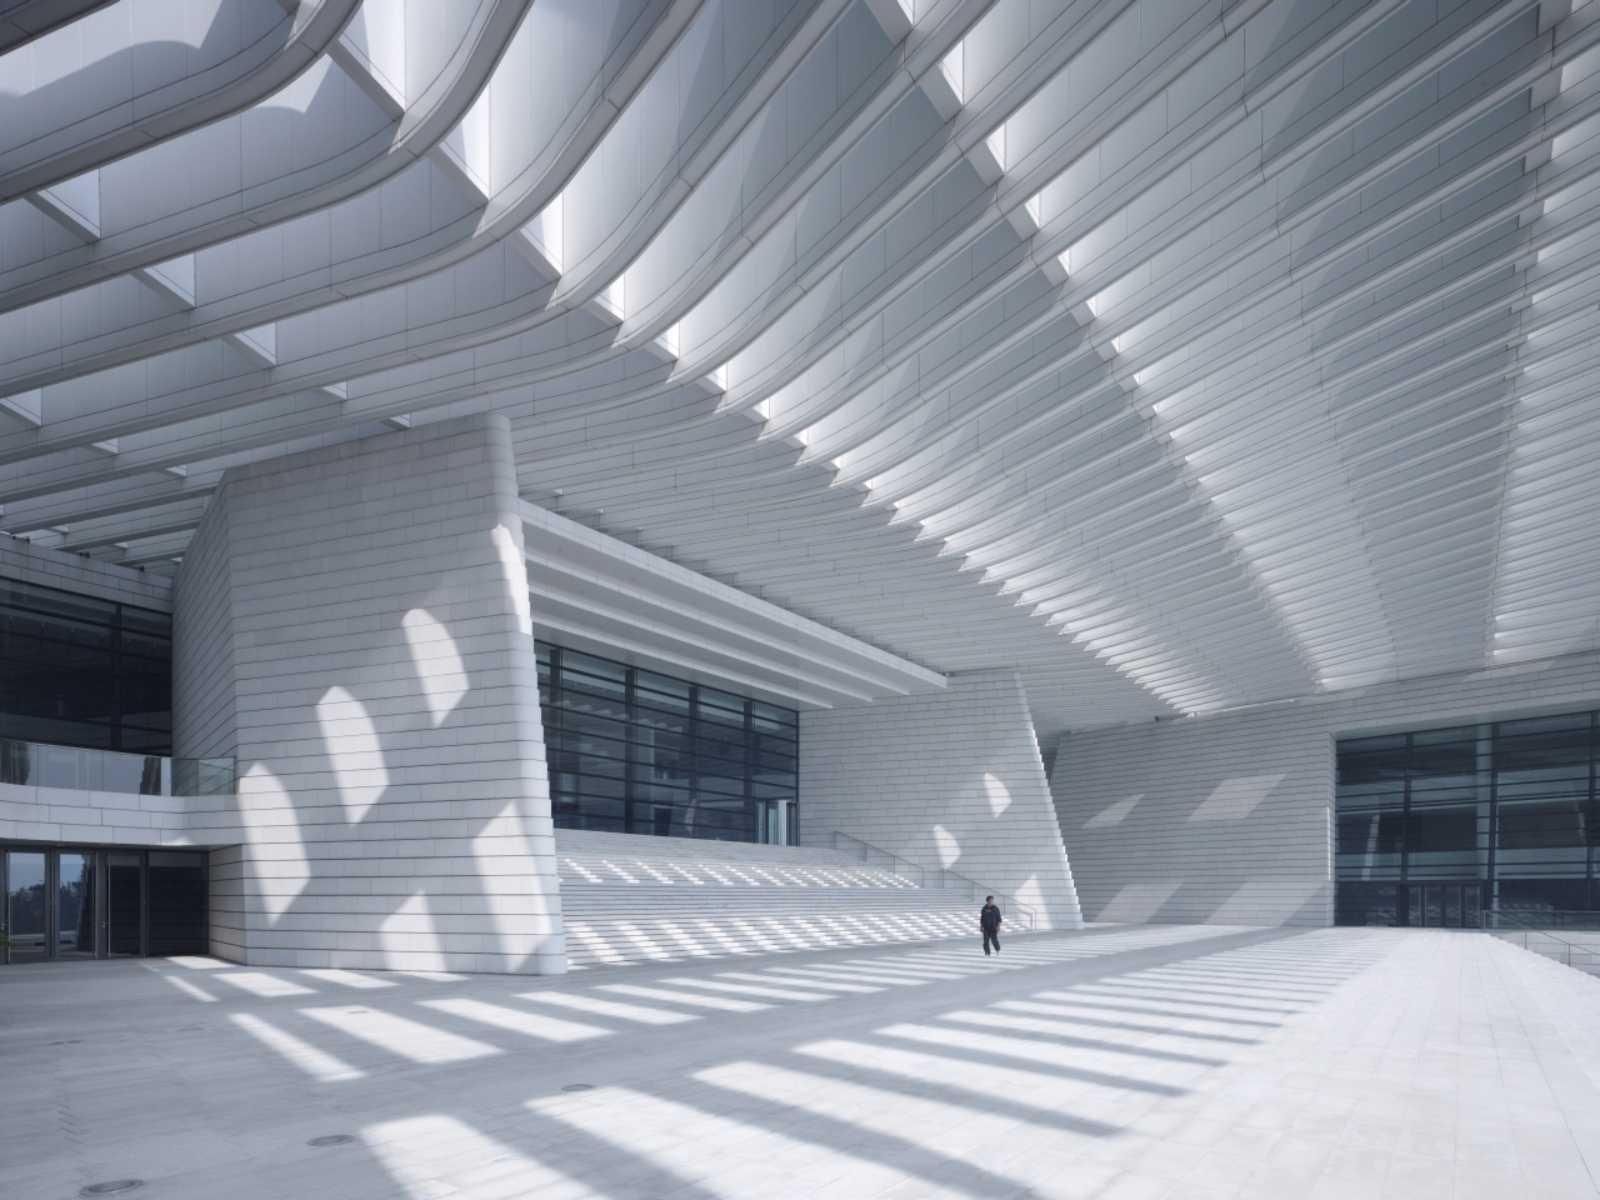 Qingdao grand theater by gmp architekten a as architecture - Gmp architektur ...